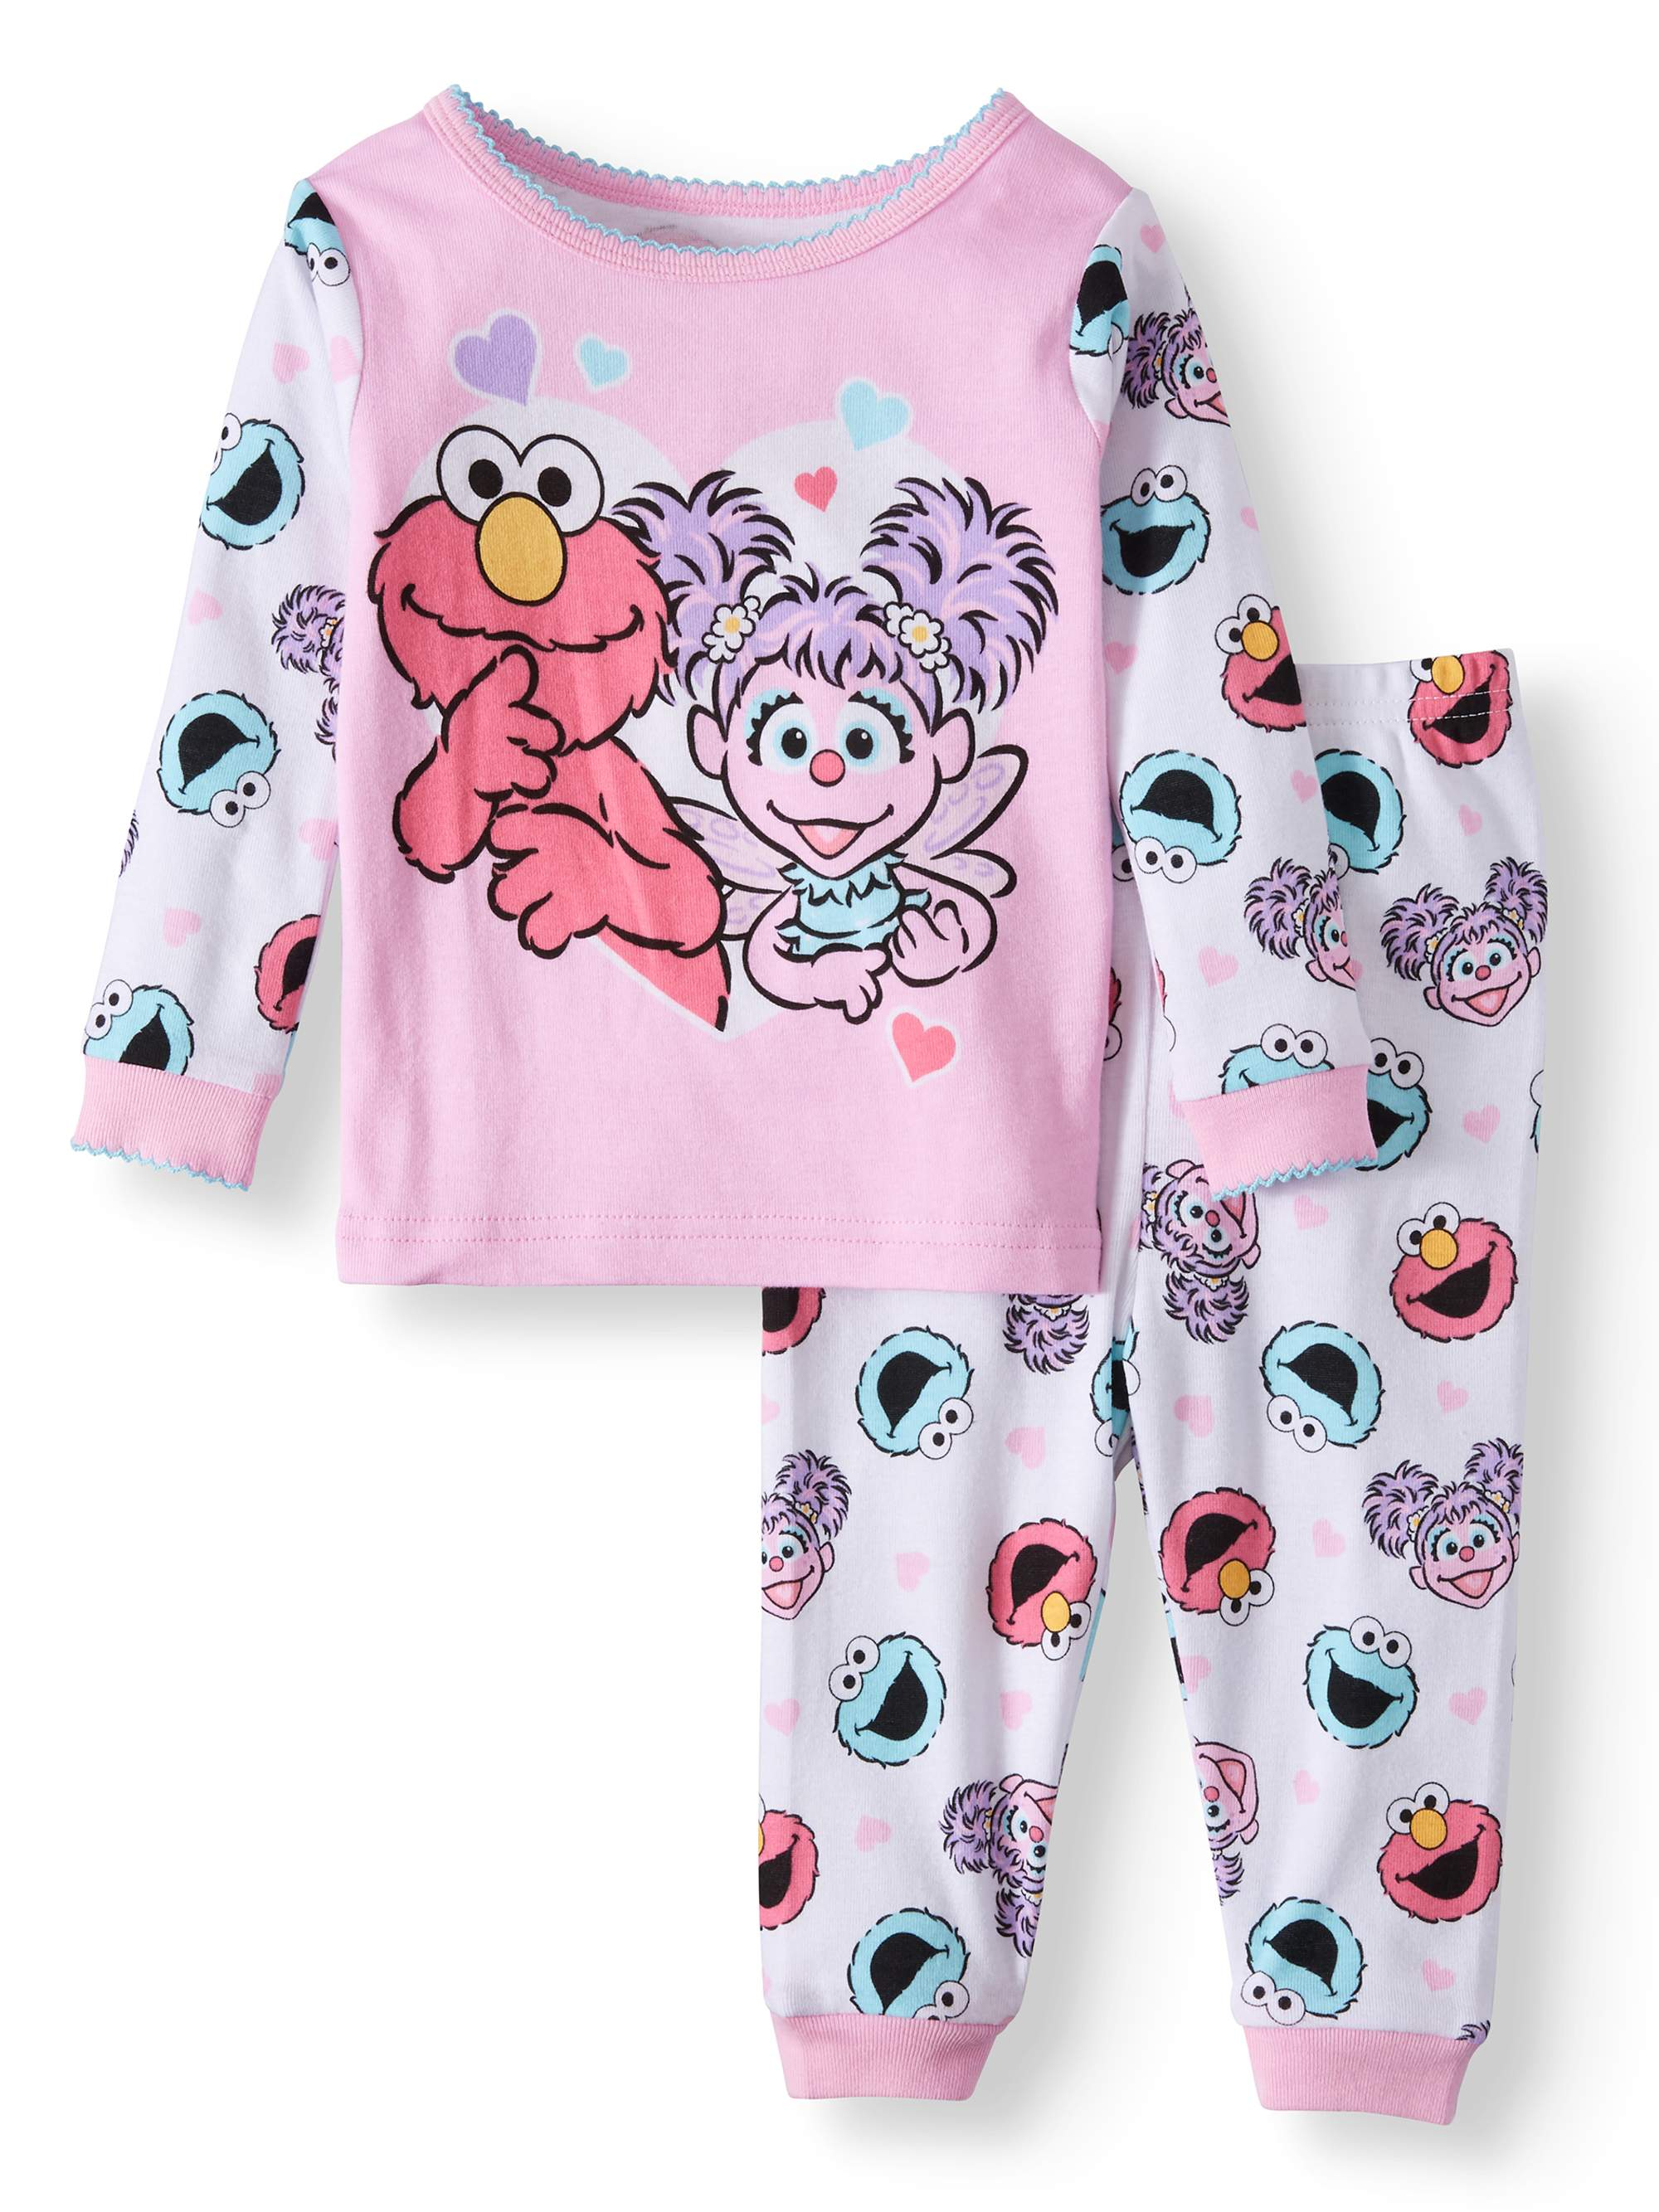 Sesame Street Baby Girls  Cotton Tight Fit Pajamas a767c3c87